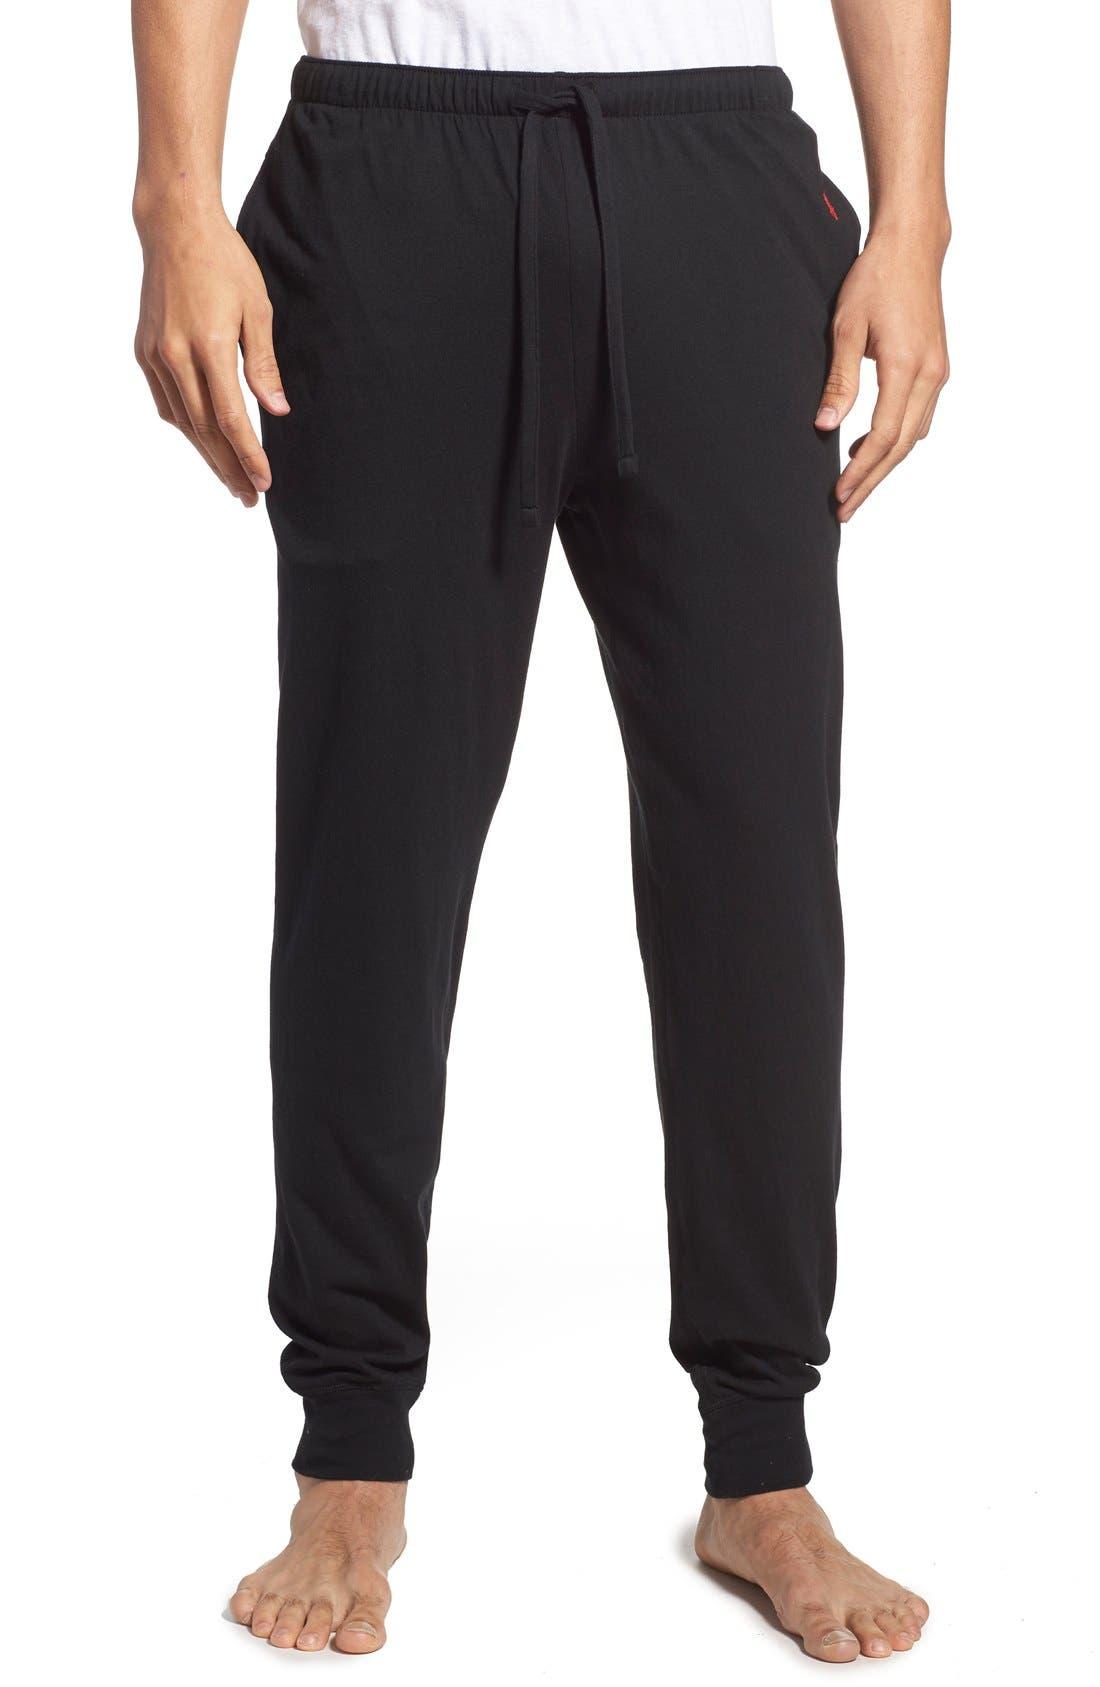 POLO RALPH LAUREN Relaxed Fit Cotton Knit Lounge Jogger Pants, Main, color, BLACK